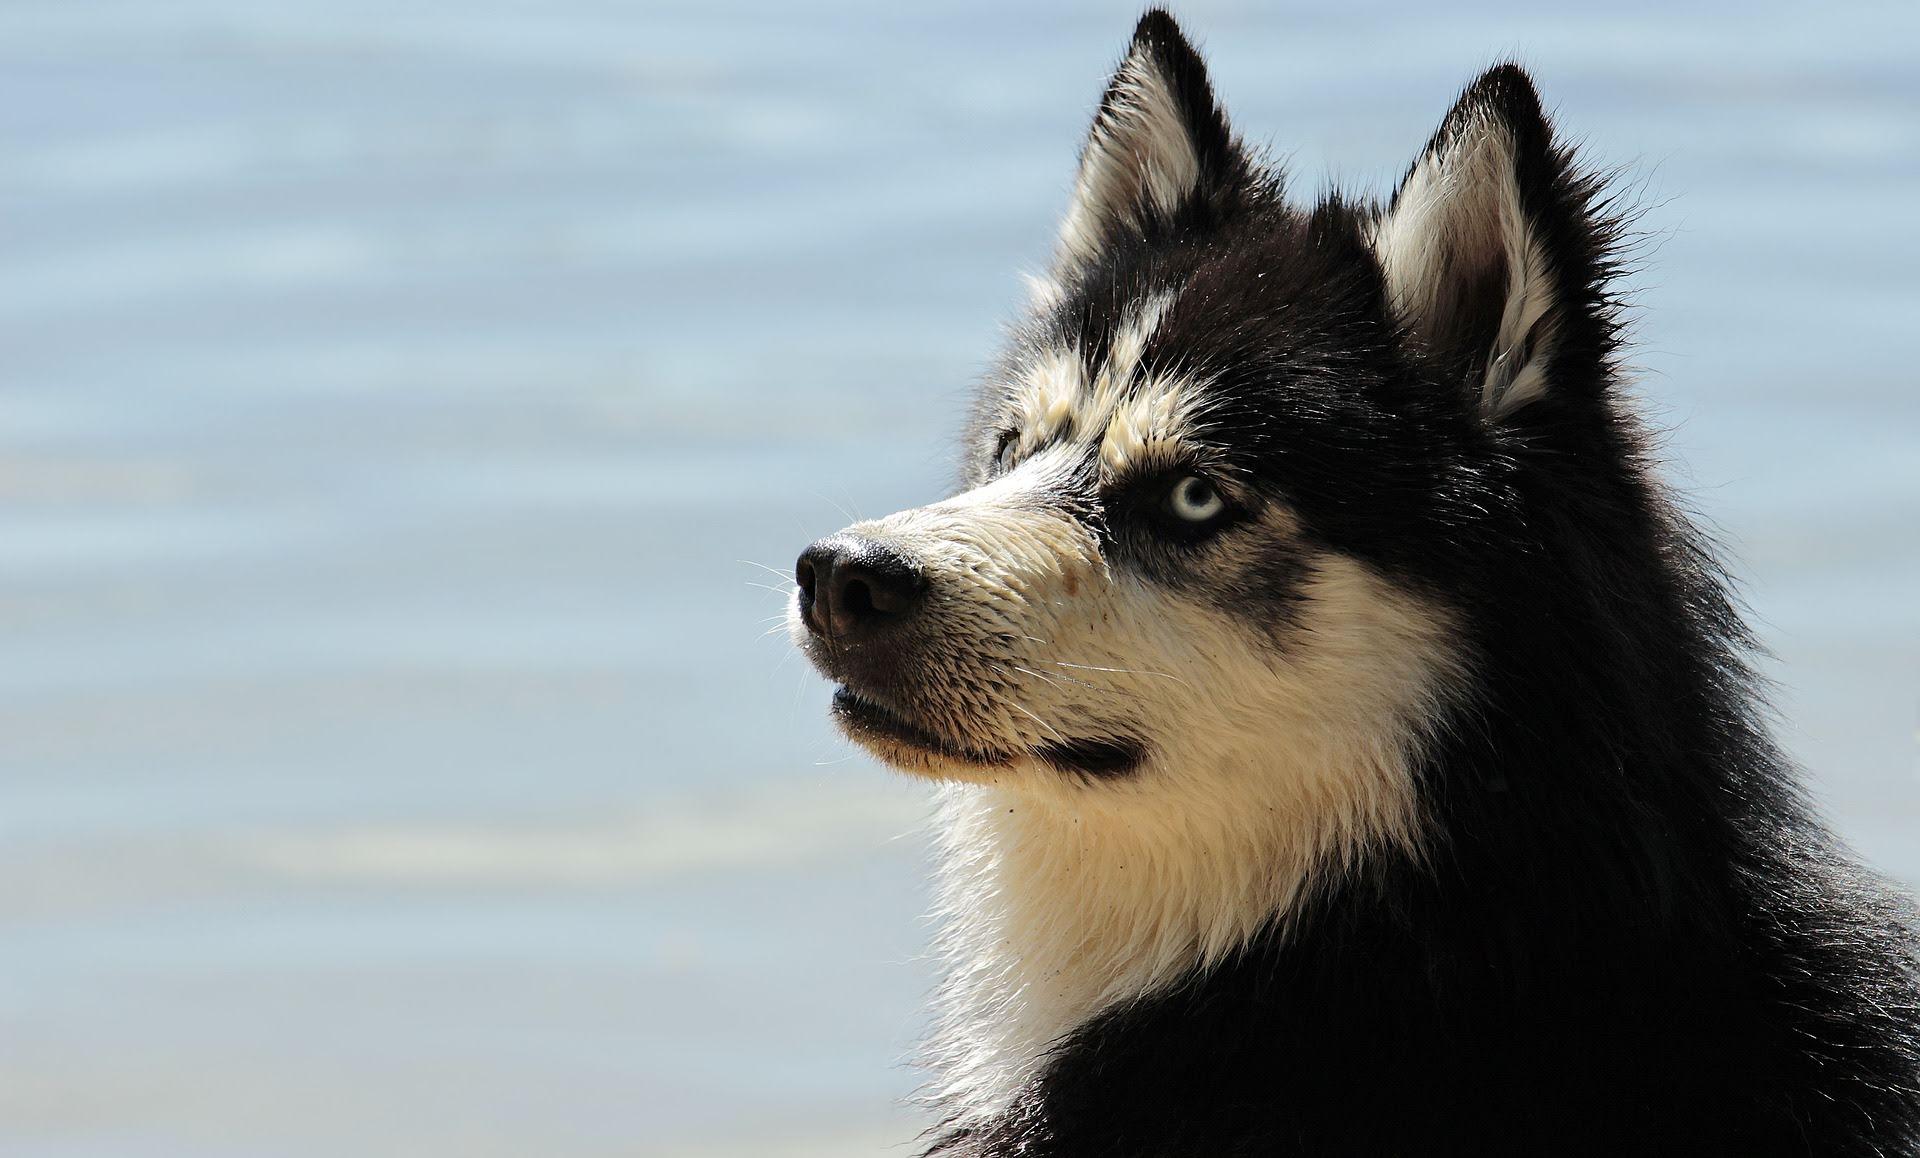 Huskey dog looking unimpressed